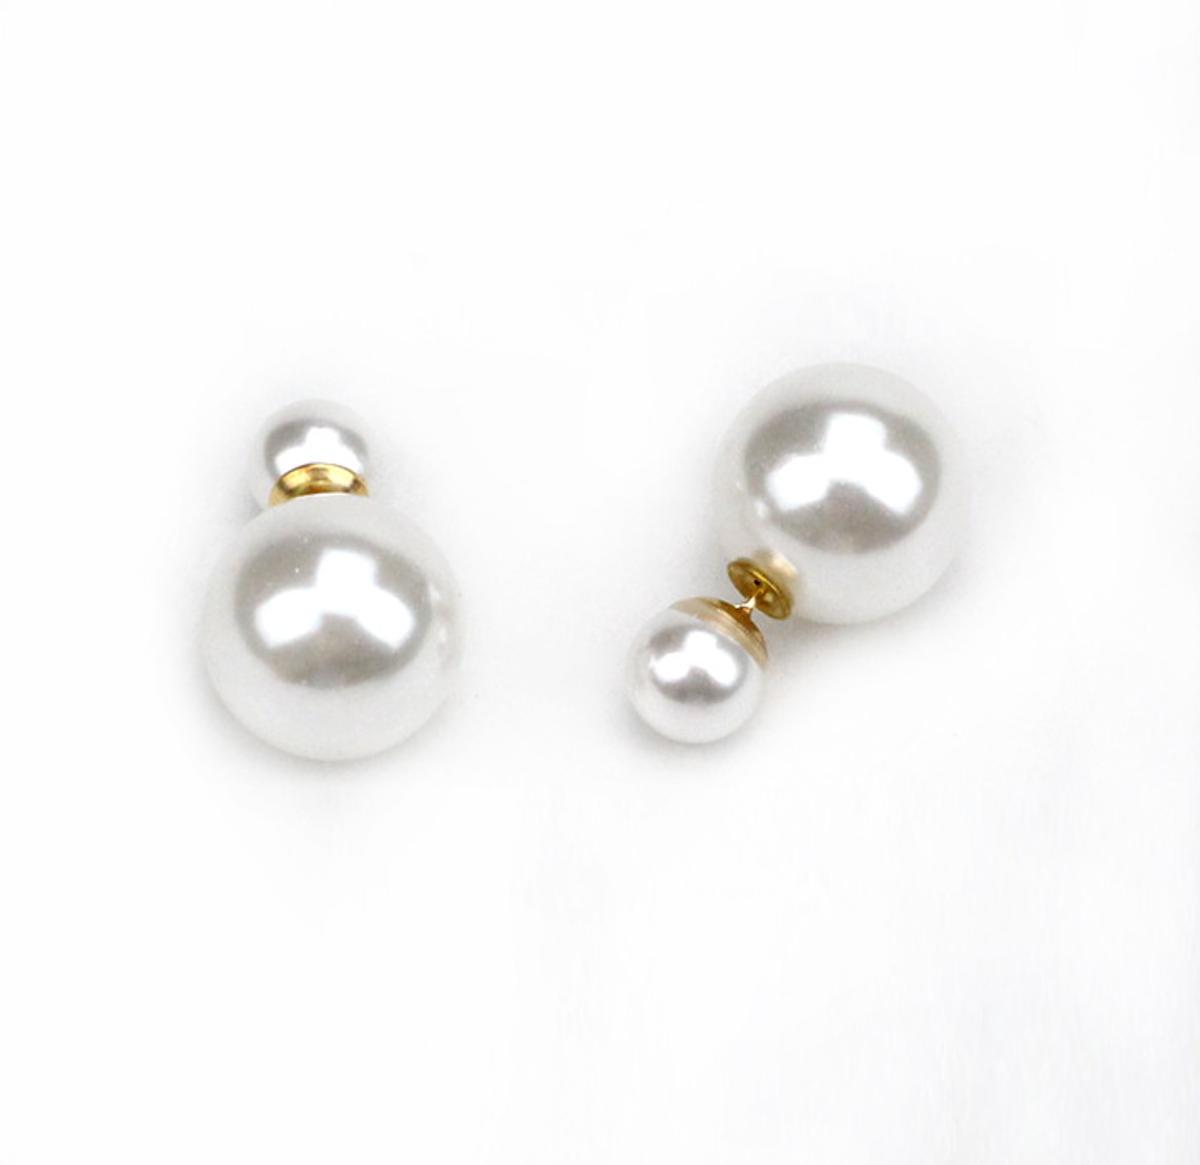 ... Náušnice s dvojitou perlou 6d3700aa7a9